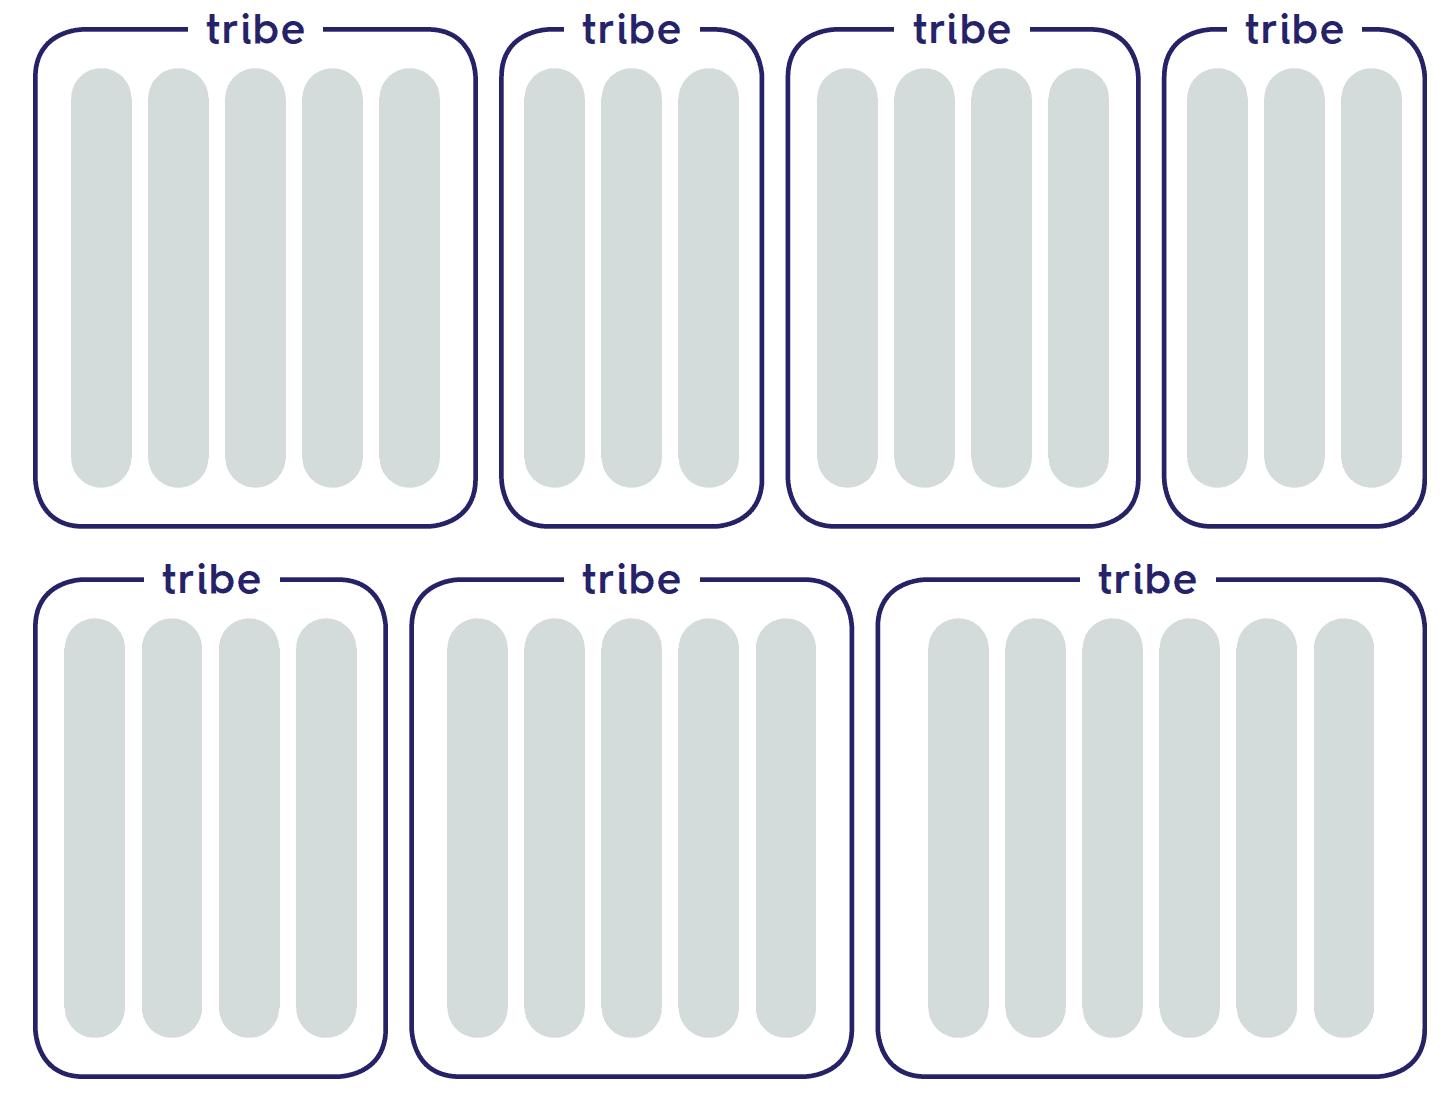 tribes uit het spotify model